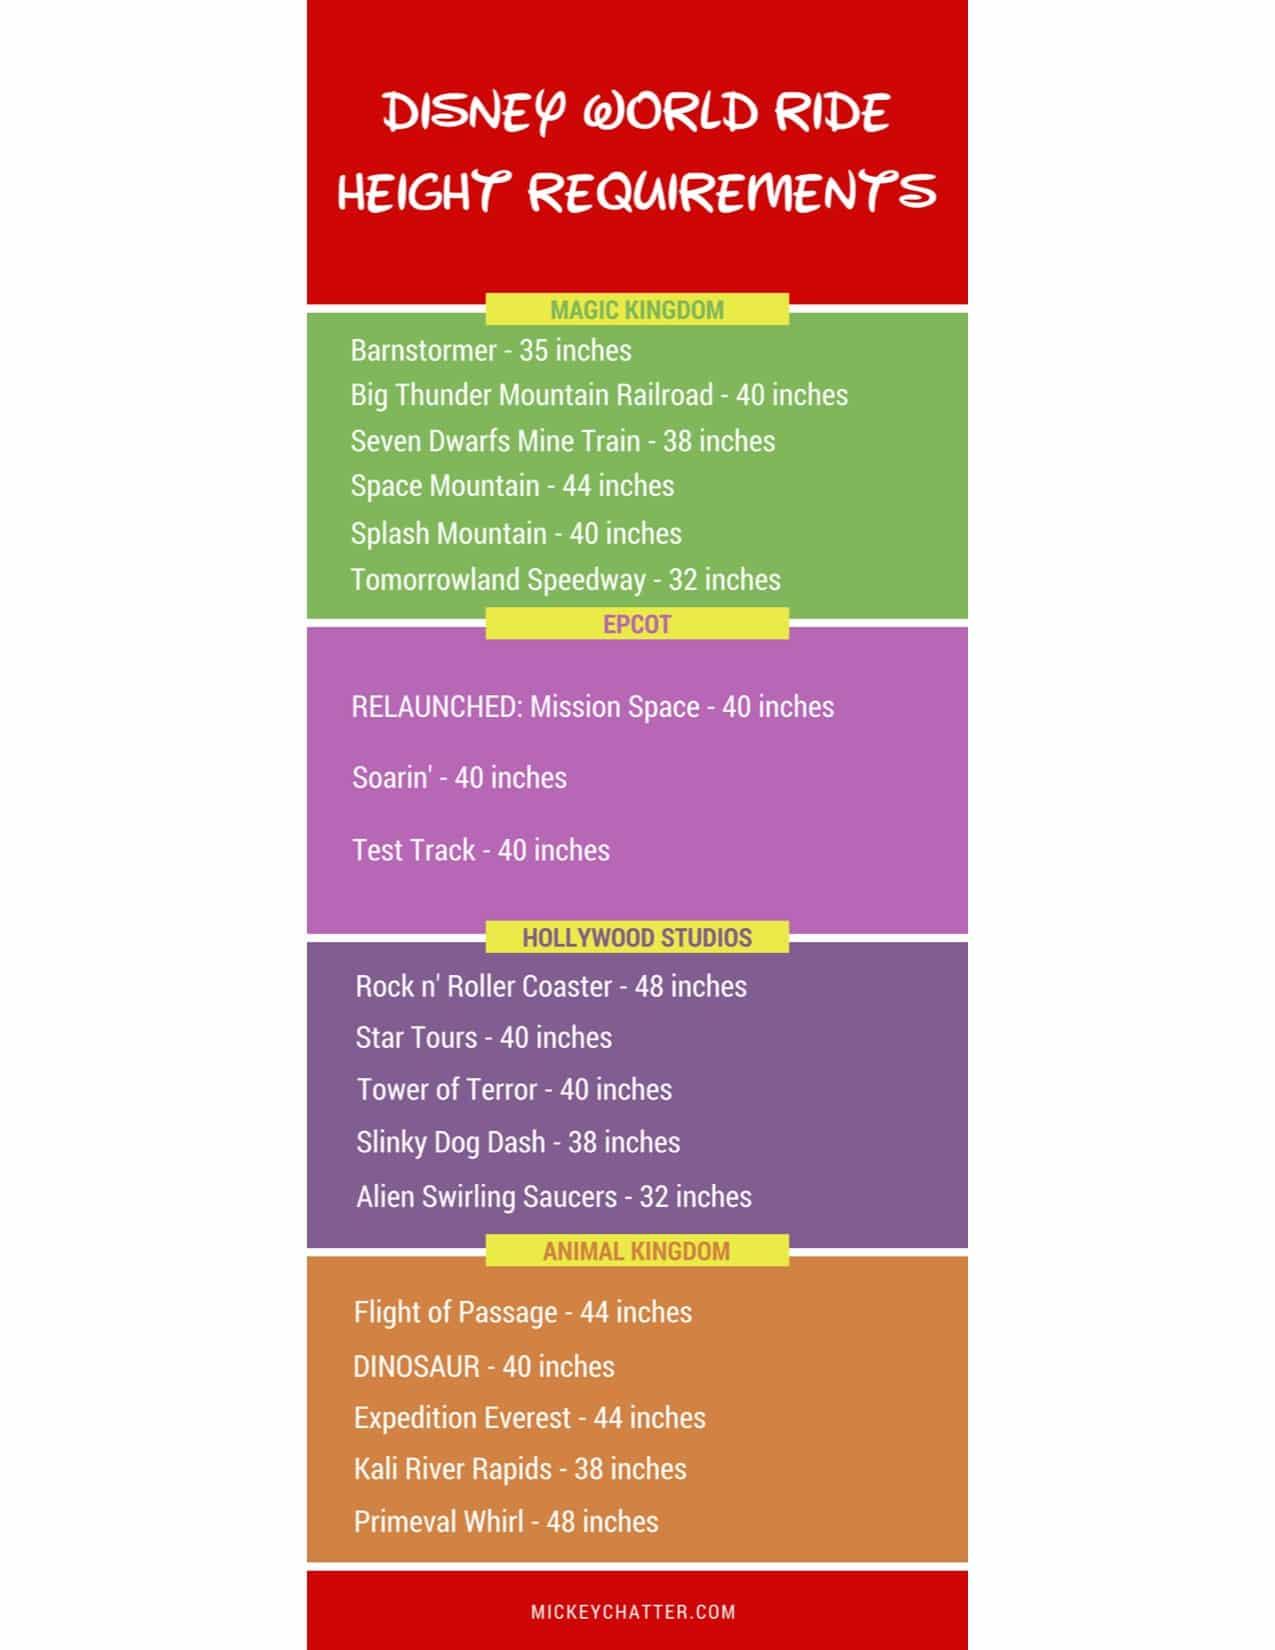 Disney Planning Printables - Mickey Chatter regarding Printable List Of Rides At Disney World 2020 Checklist